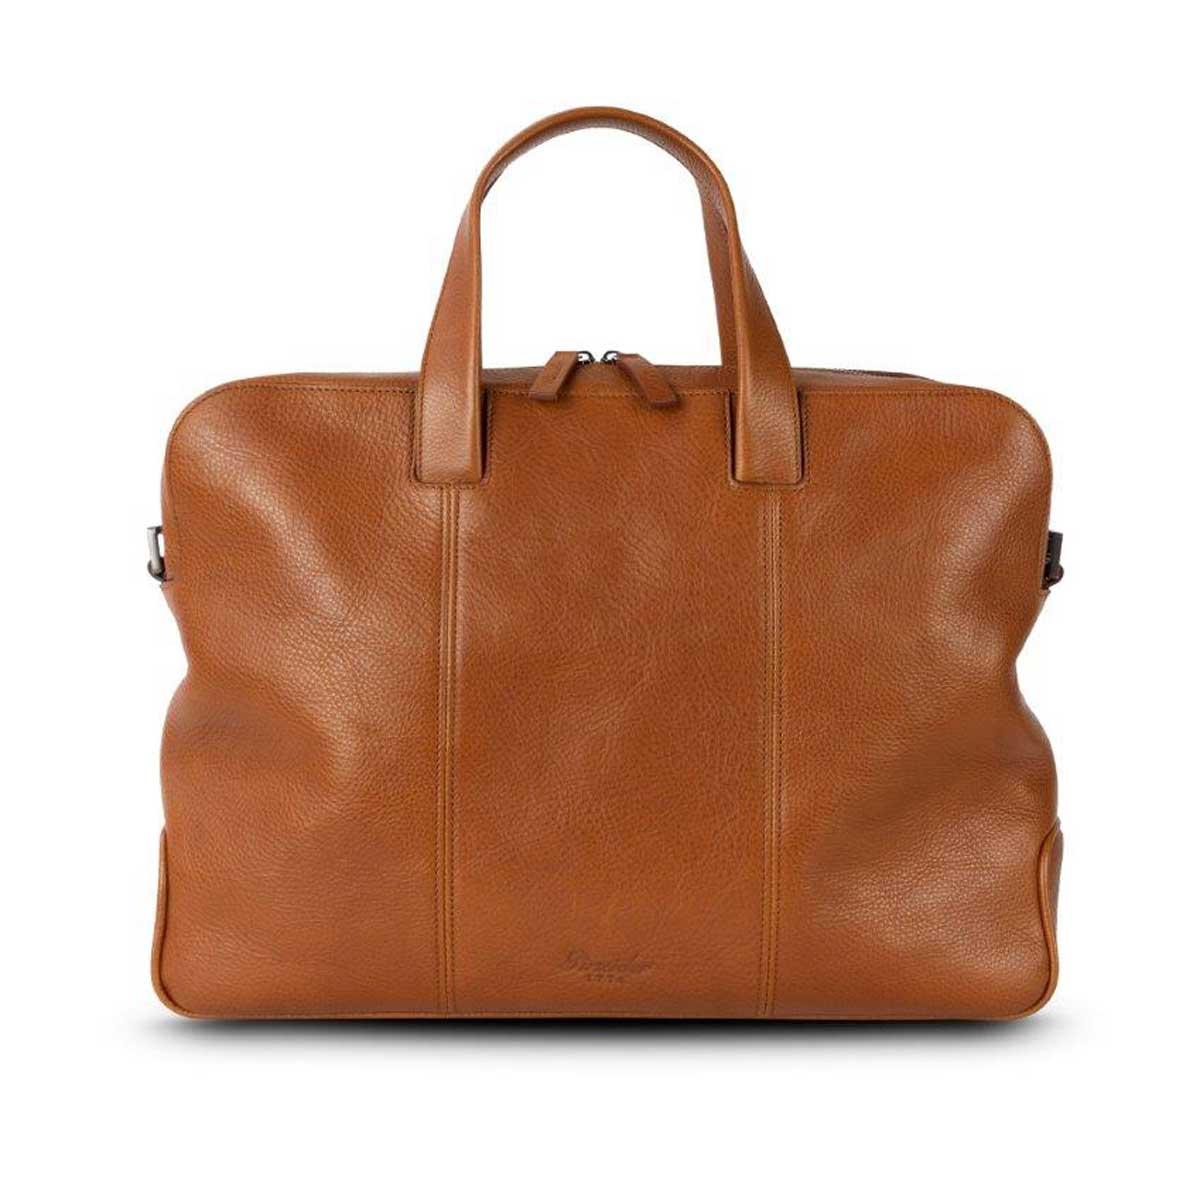 ede4228b80b4 Pineider Country Cognac Leather 2-Handle Document & Laptop Bag | Shoulder  Strap